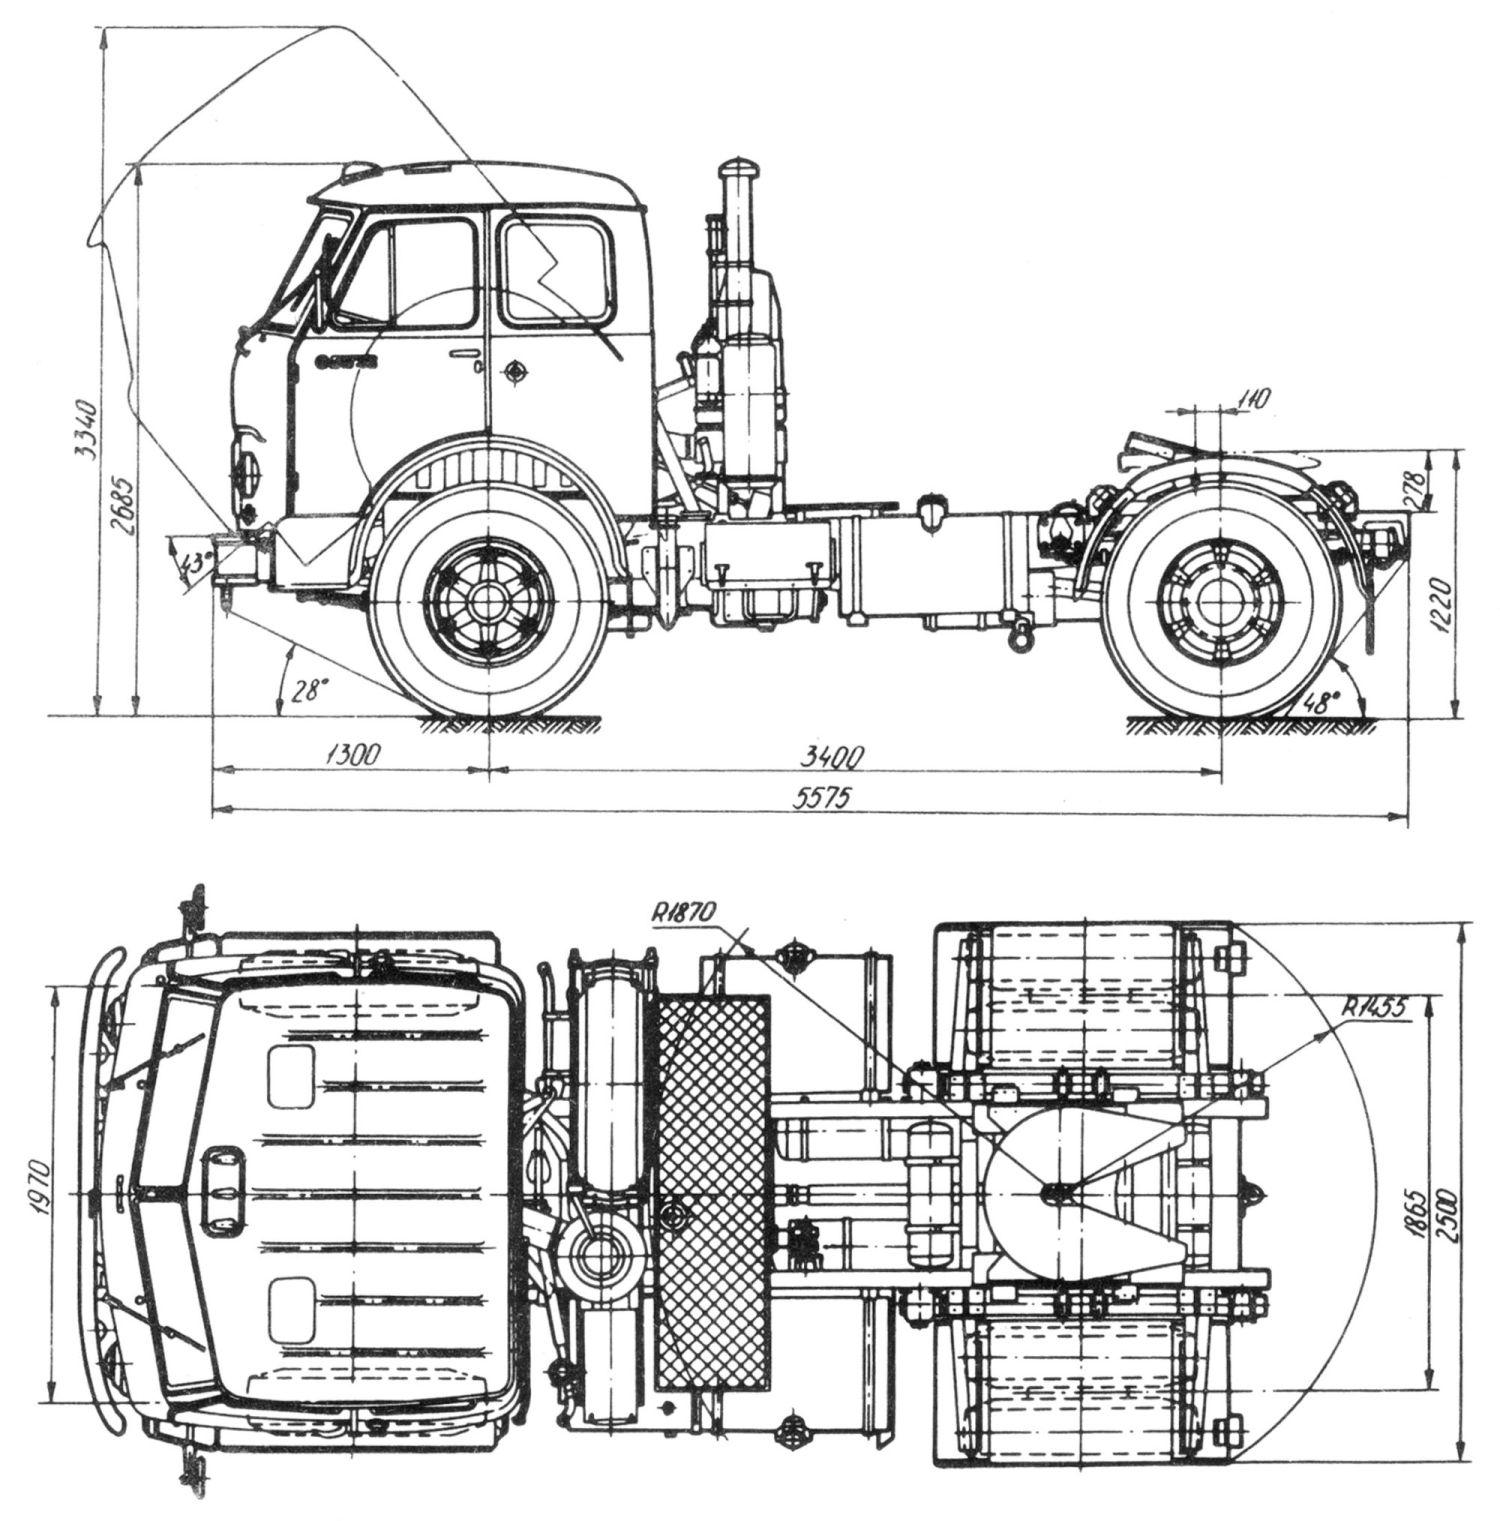 MAZ 504V blueprint